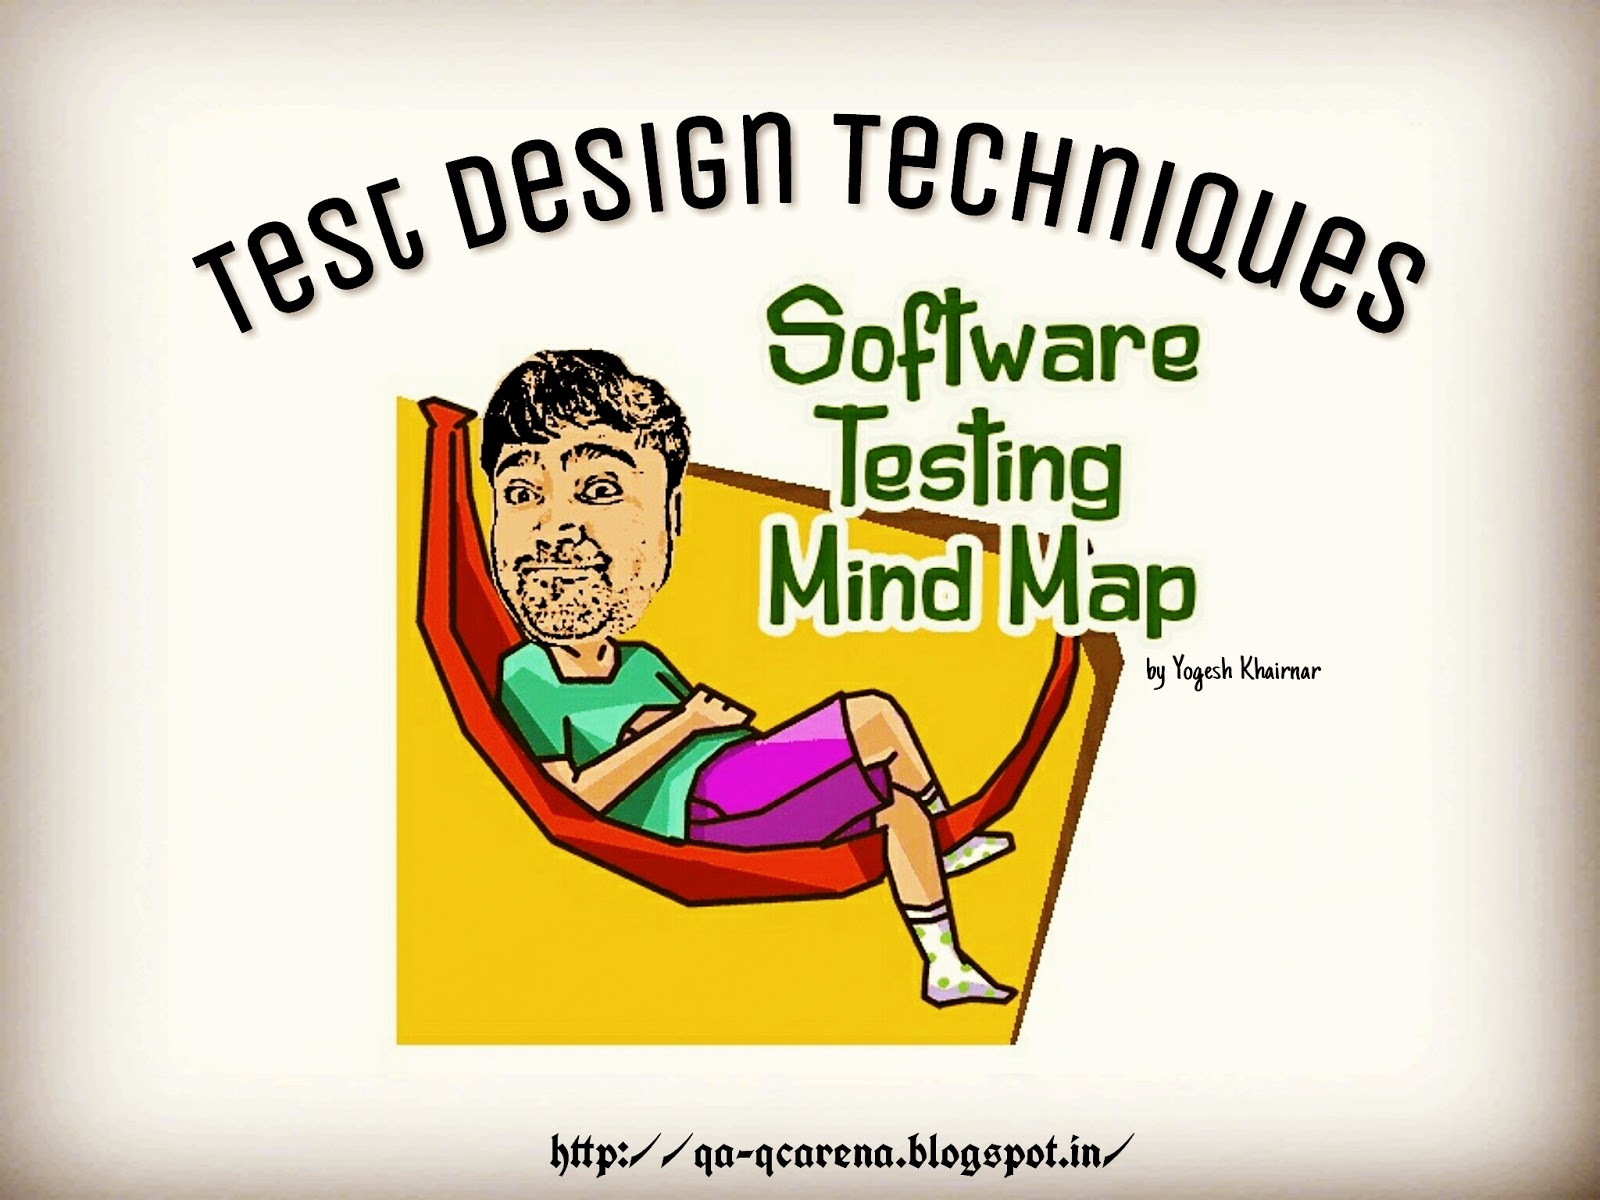 QA-QC Arena: Software Testing Mind Maps – Test Design Techniques